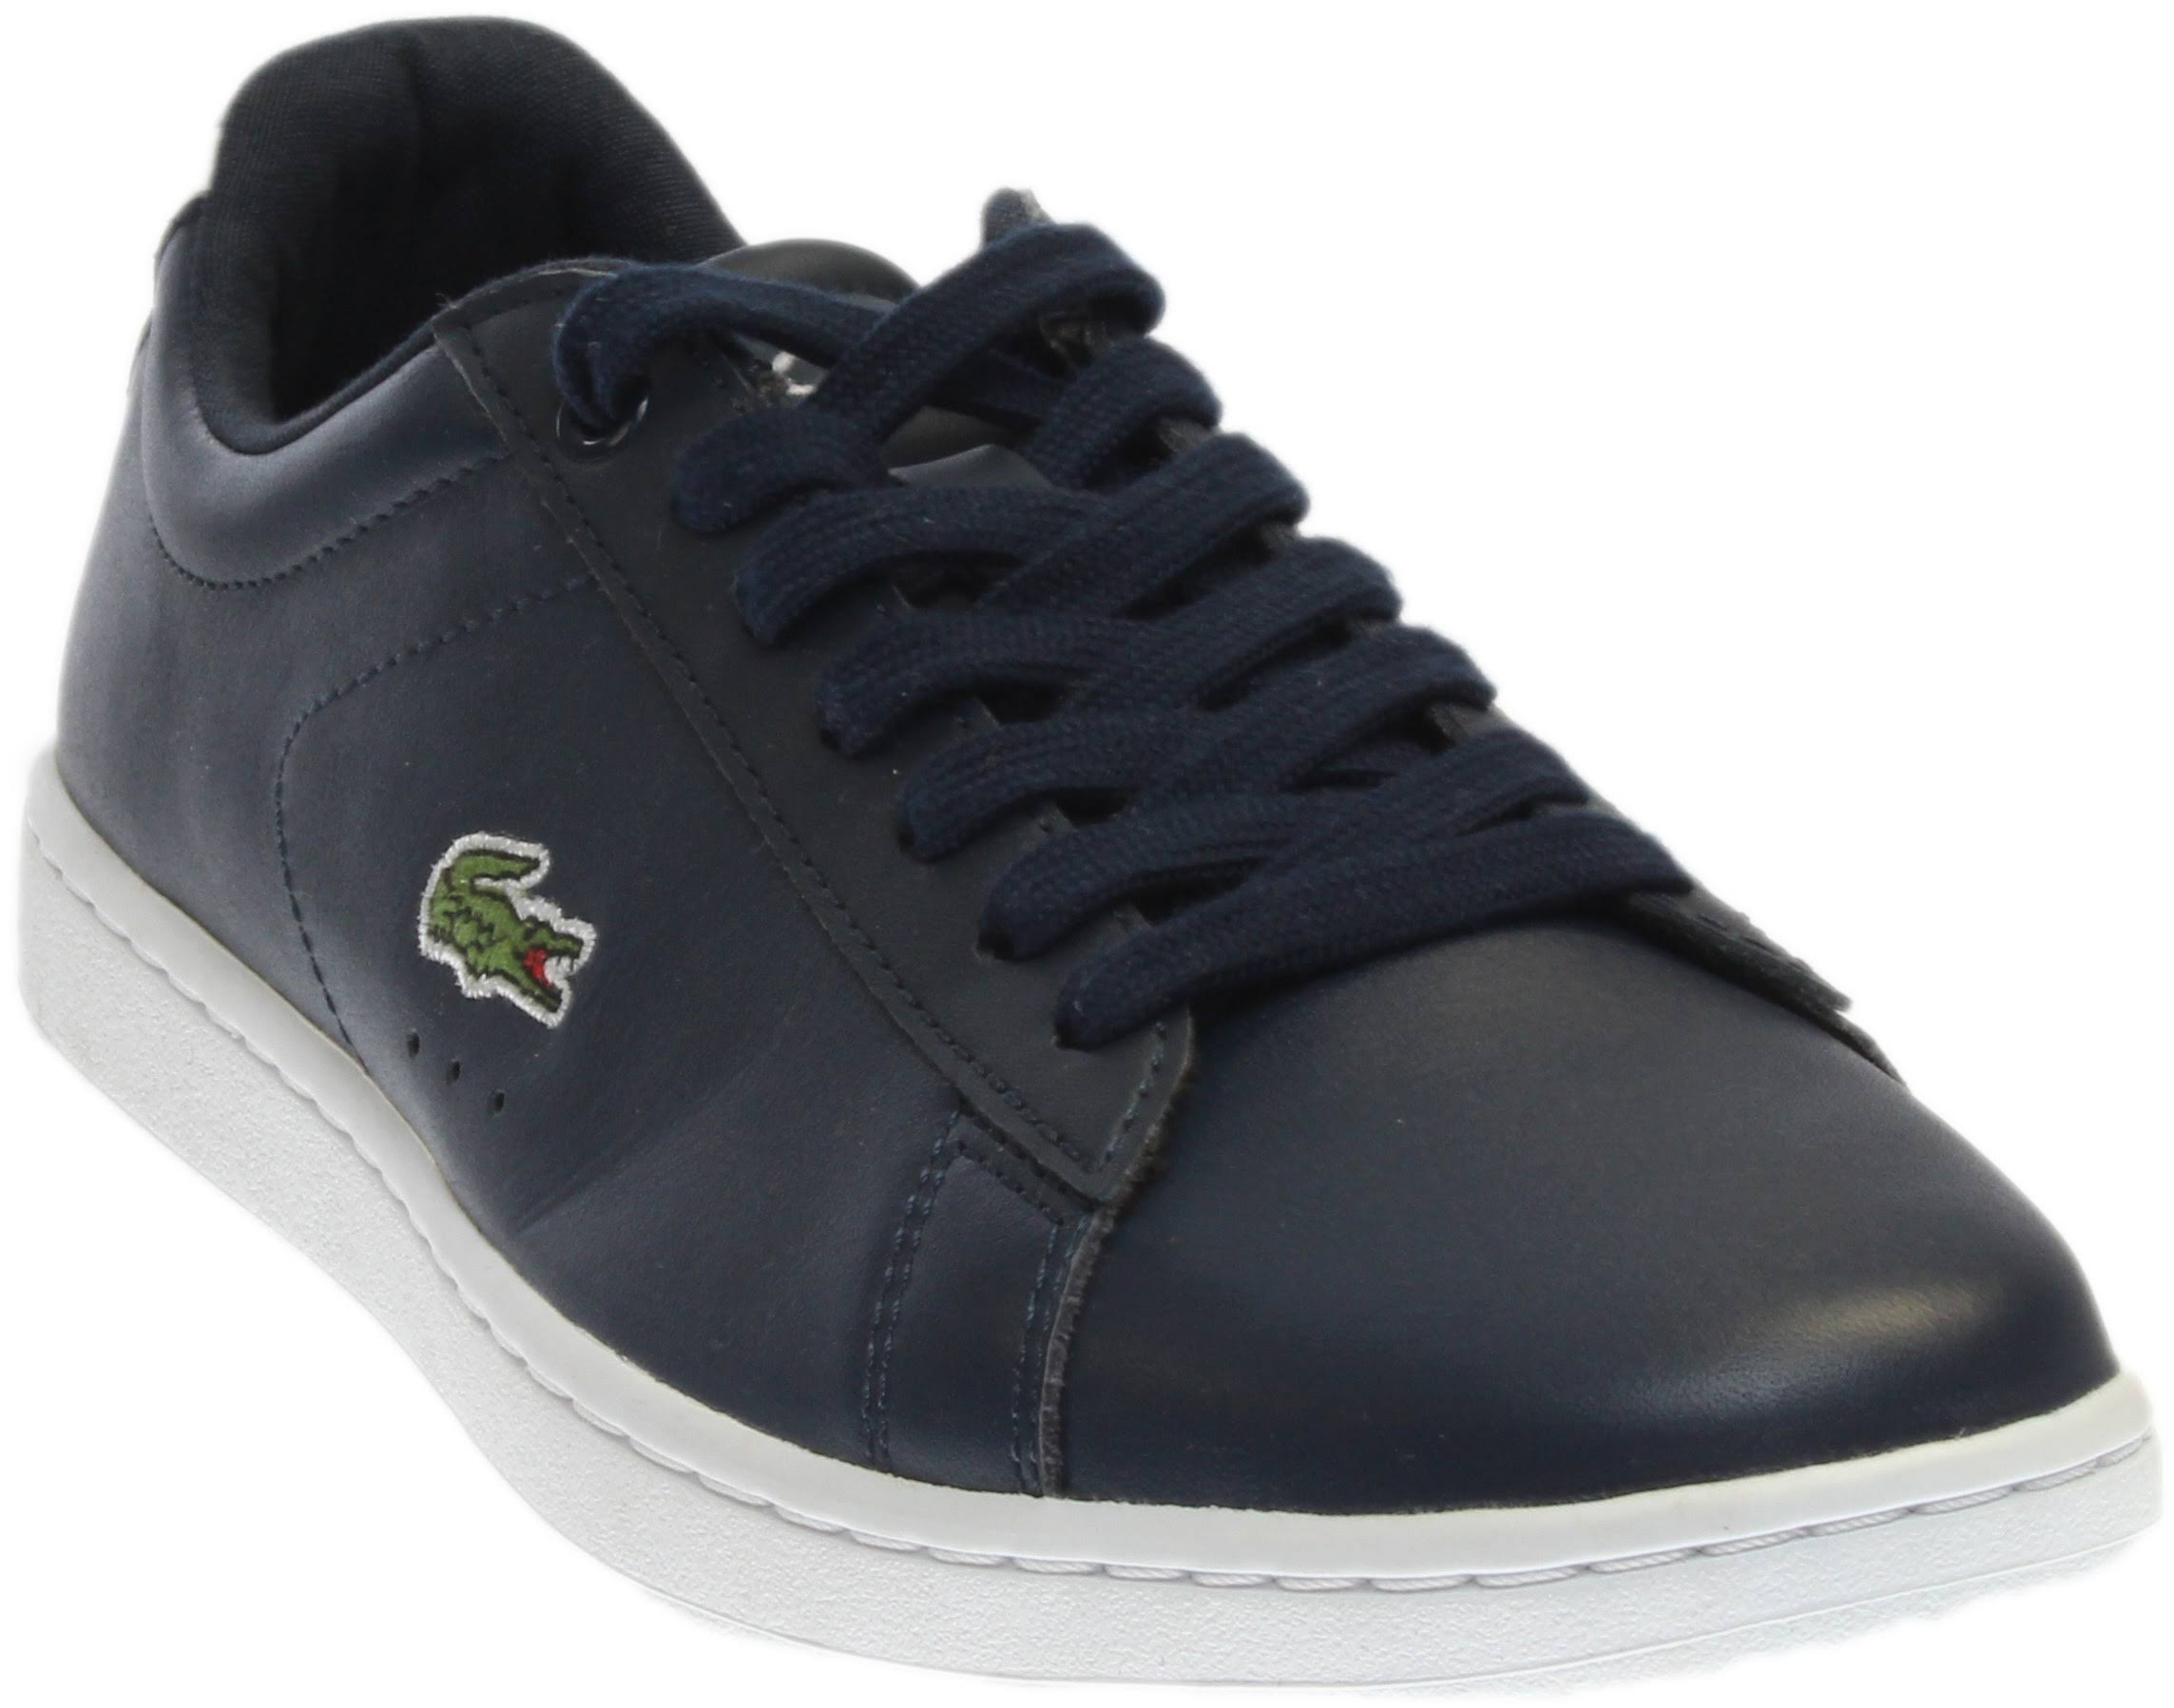 Lacoste Women's Women's Women's Carnaby EVO BL 1 shoes Navy bluee Lace Up Seakers cb4e16